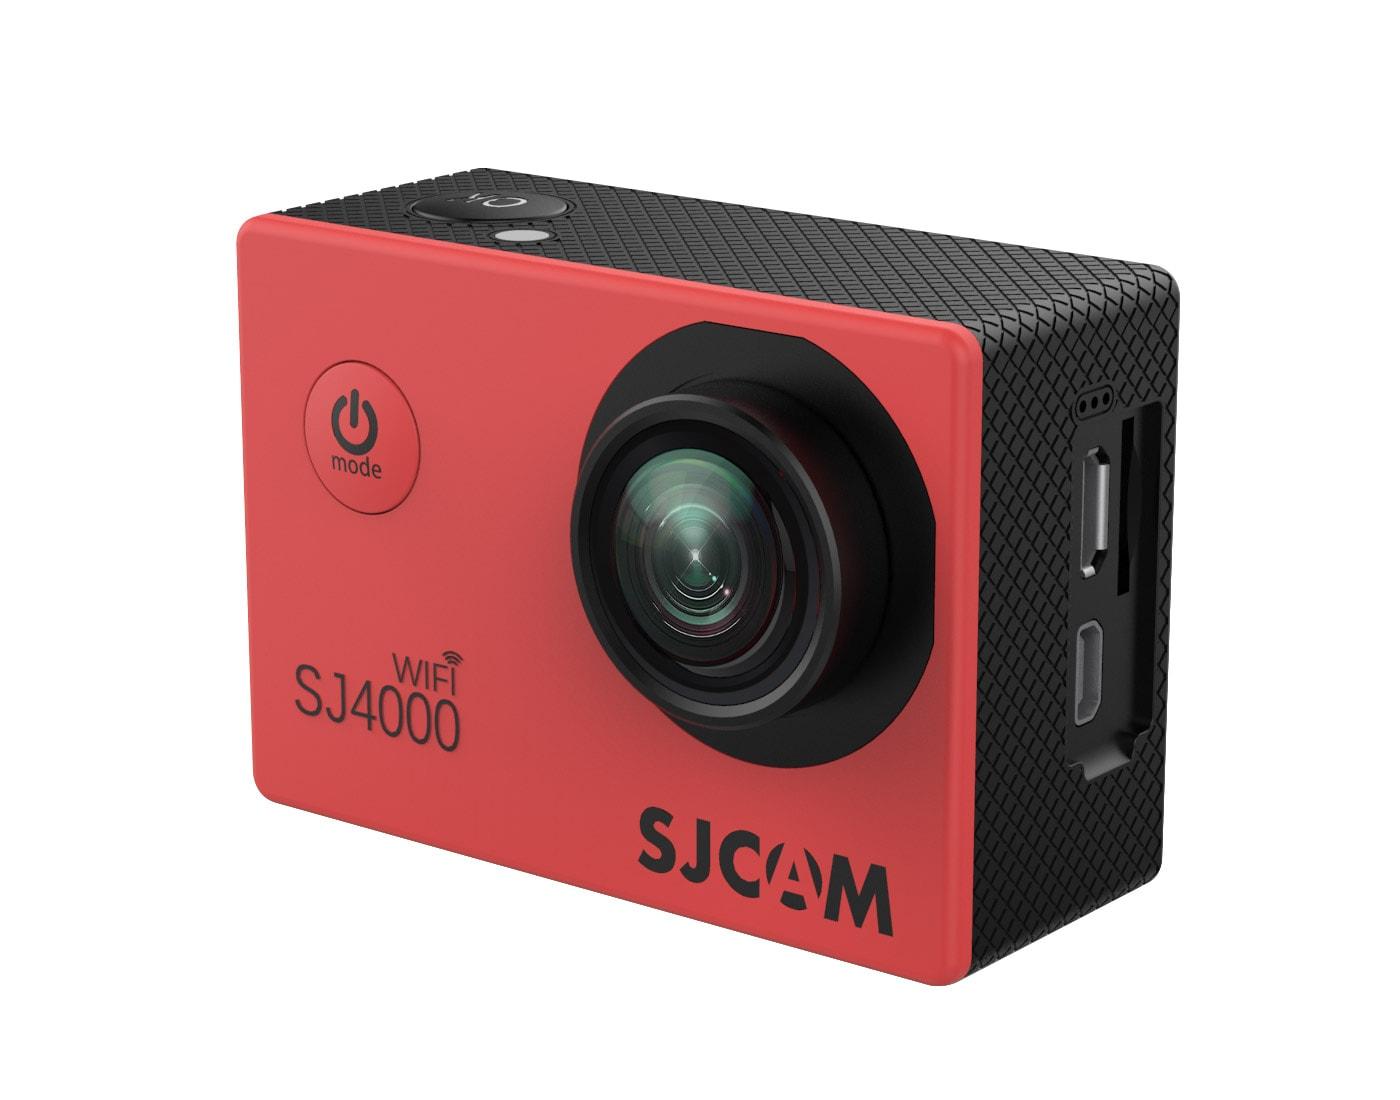 SJCAM SJ4000 WIFI Action Camera FHD1080P waterproof Underwater Camera 12MP Sports Camcorder  Red - 5